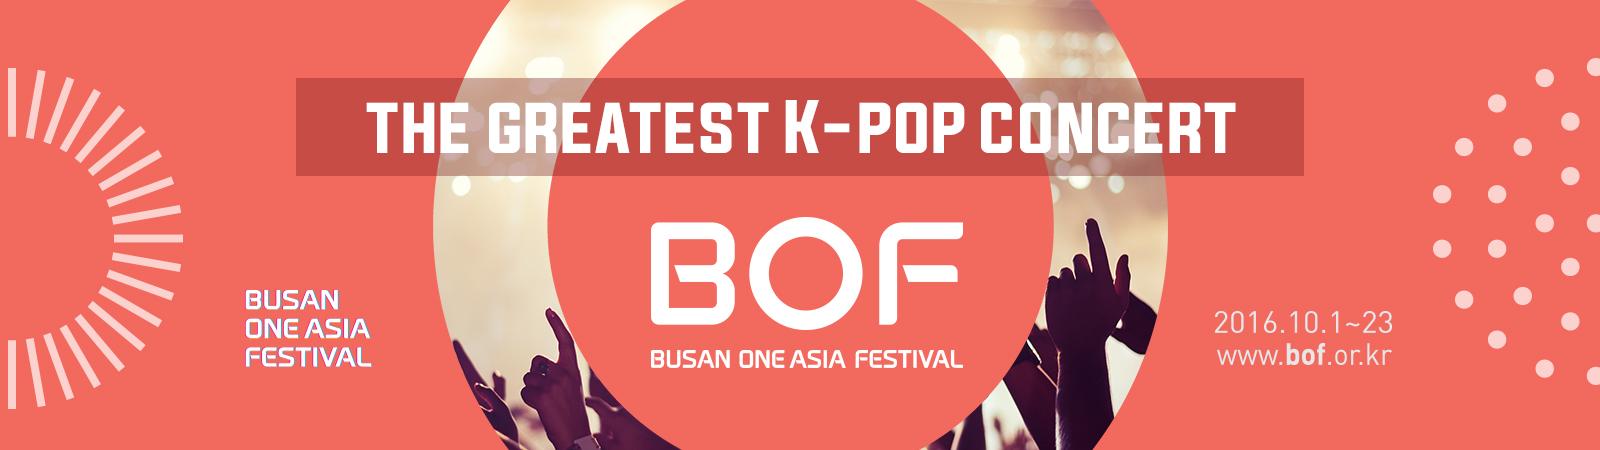 BOF Busan One Asia Festival